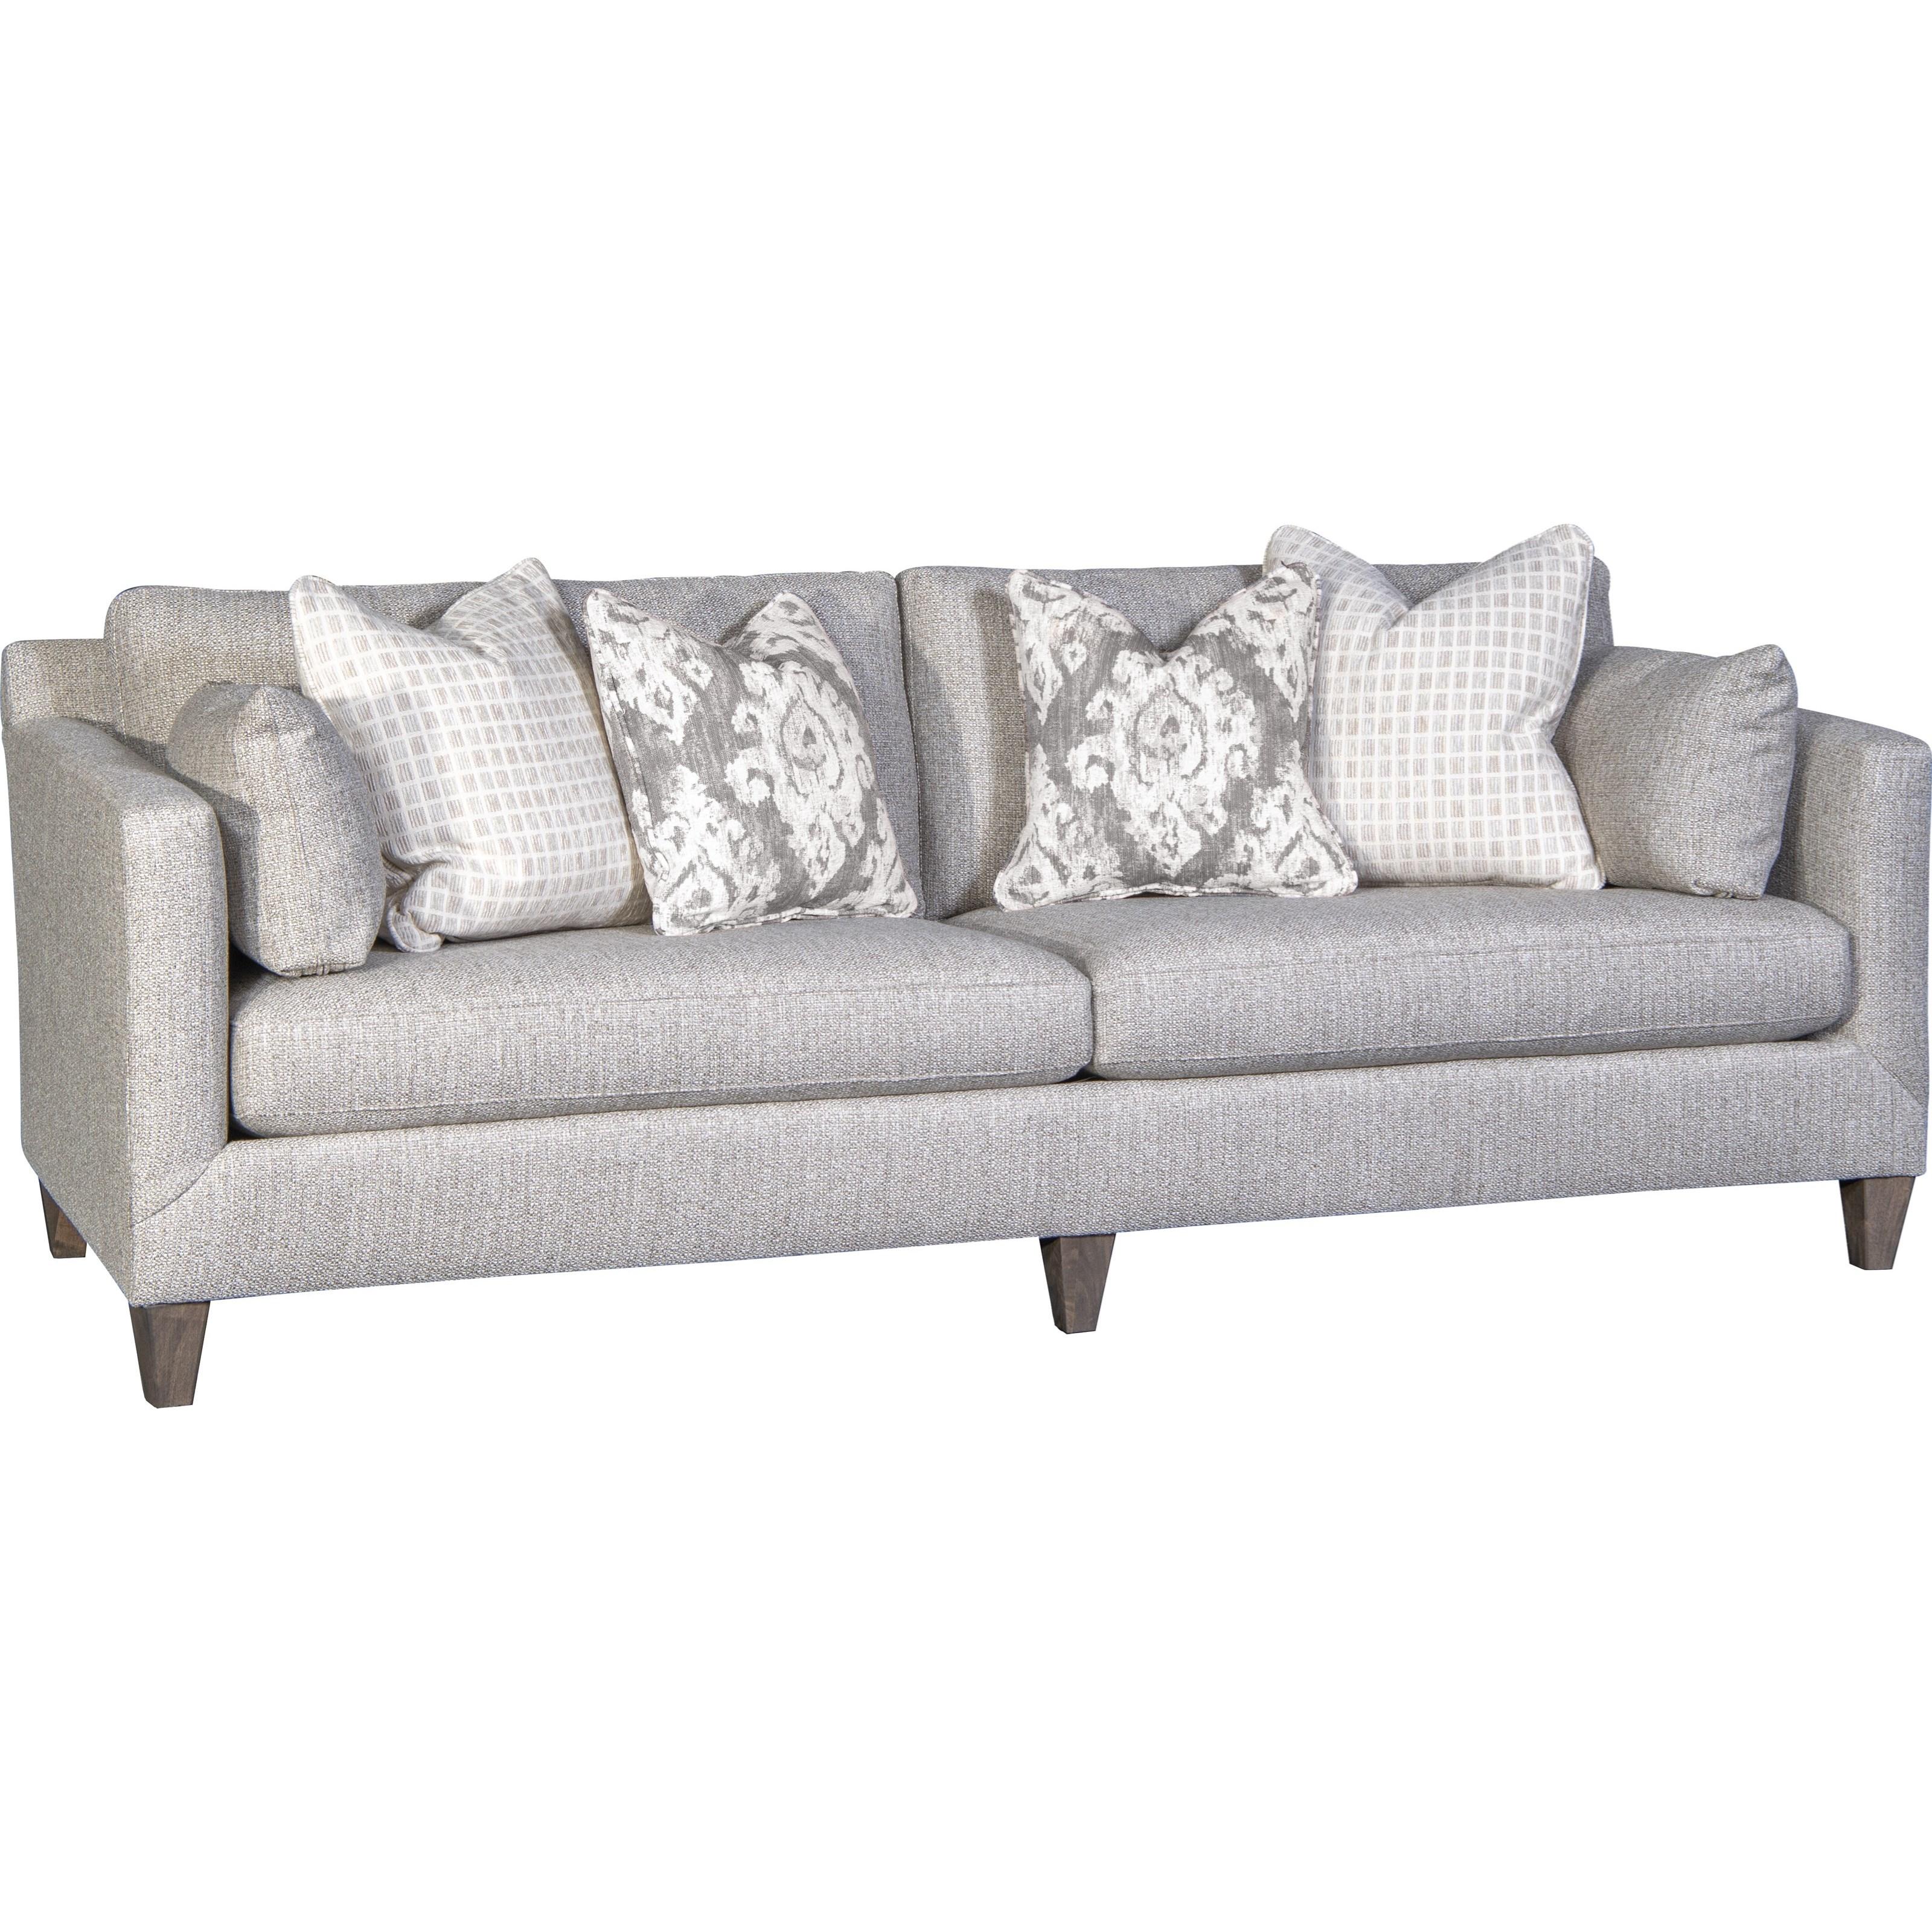 3555 Sofa by Mayo at Story & Lee Furniture